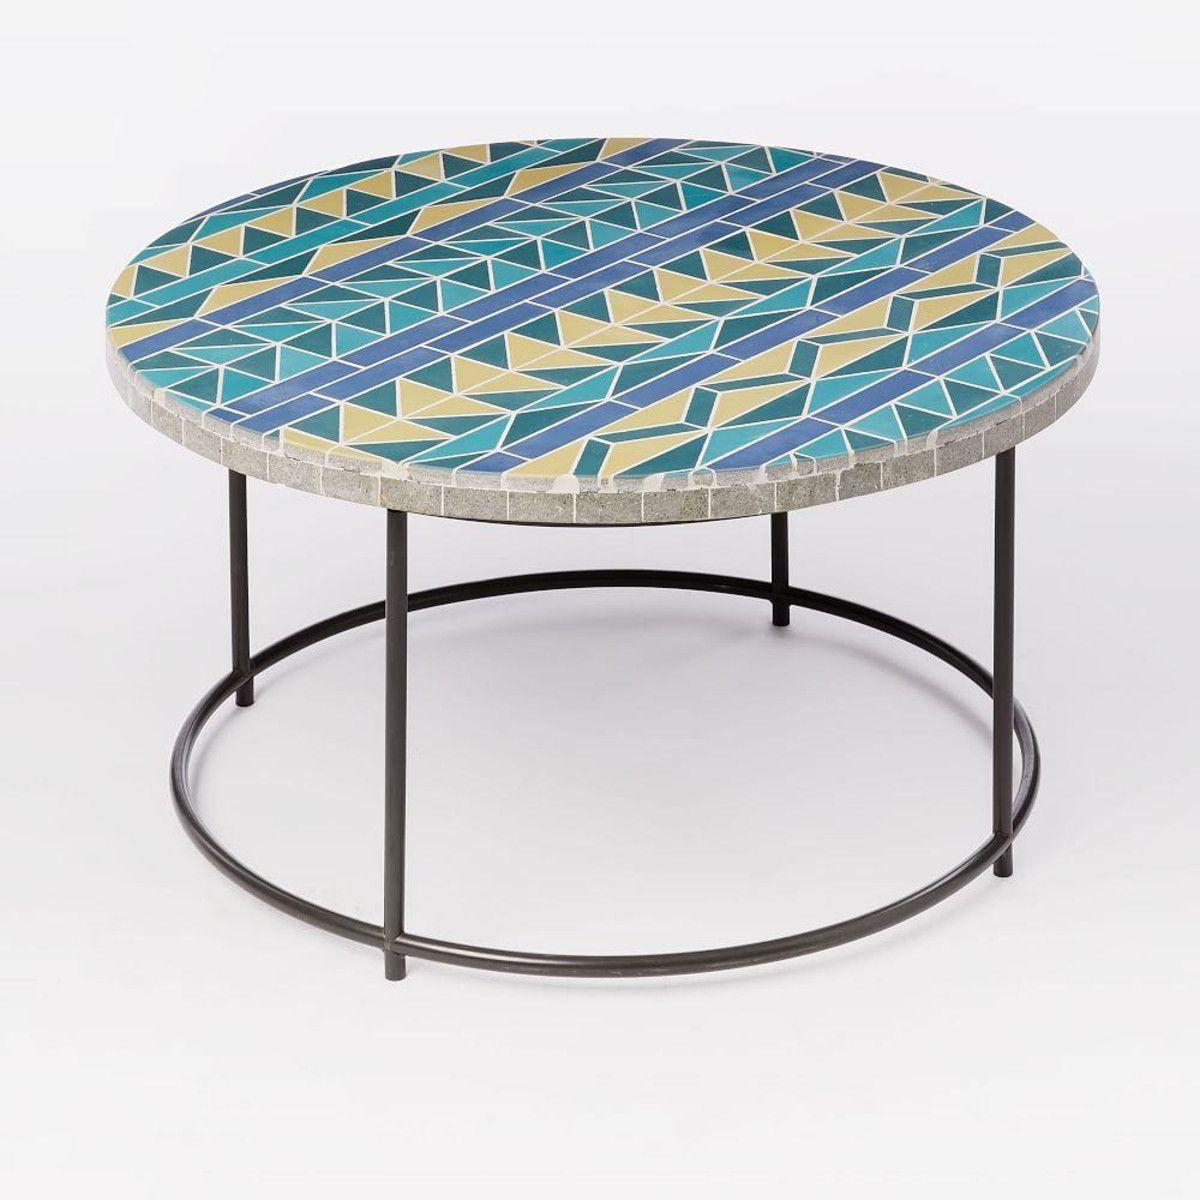 Mosaic tiled coffee table multi triangle metal base west elm uk